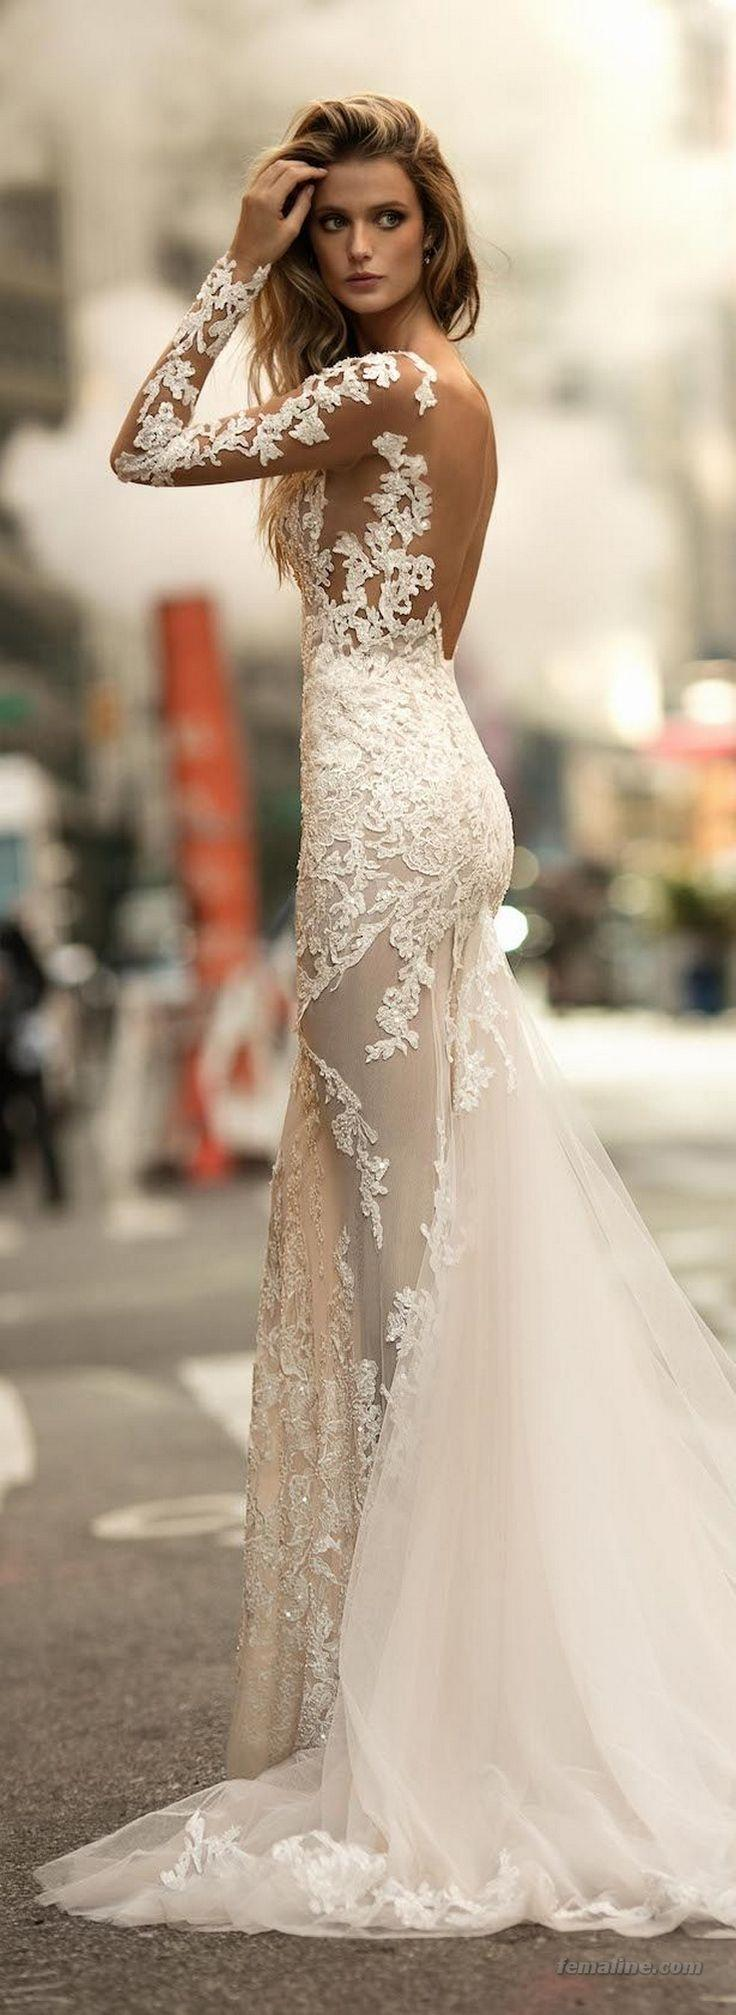 Wedding - 139 Ideas For Fall 2017 Wedding Dress Trends